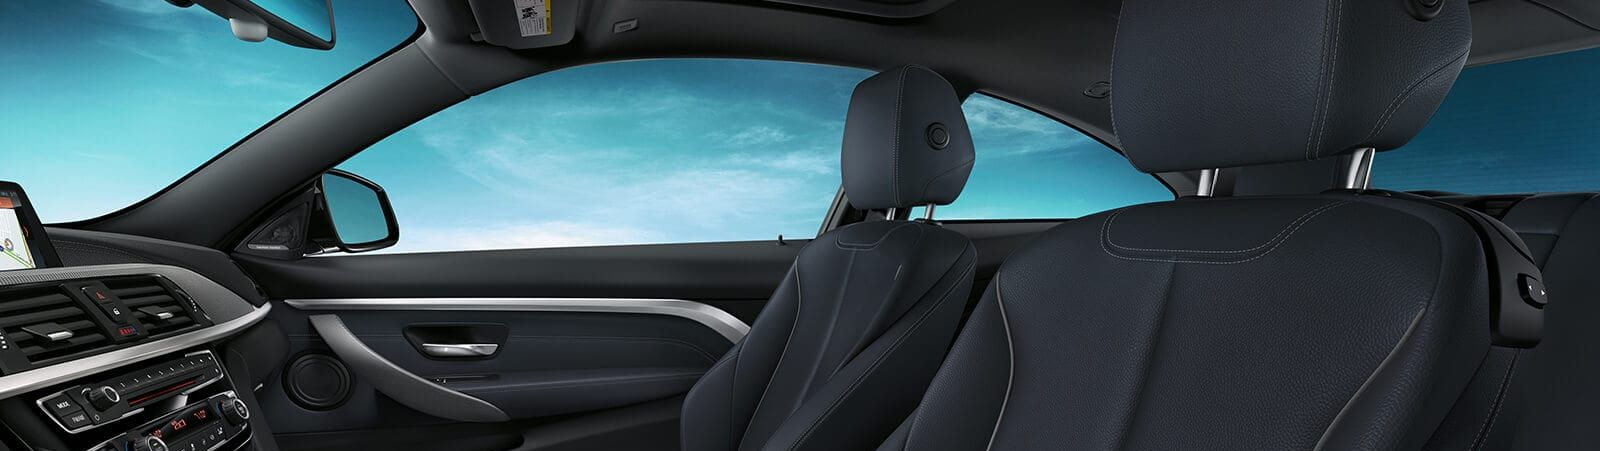 2020 BMW 4 Series Interior